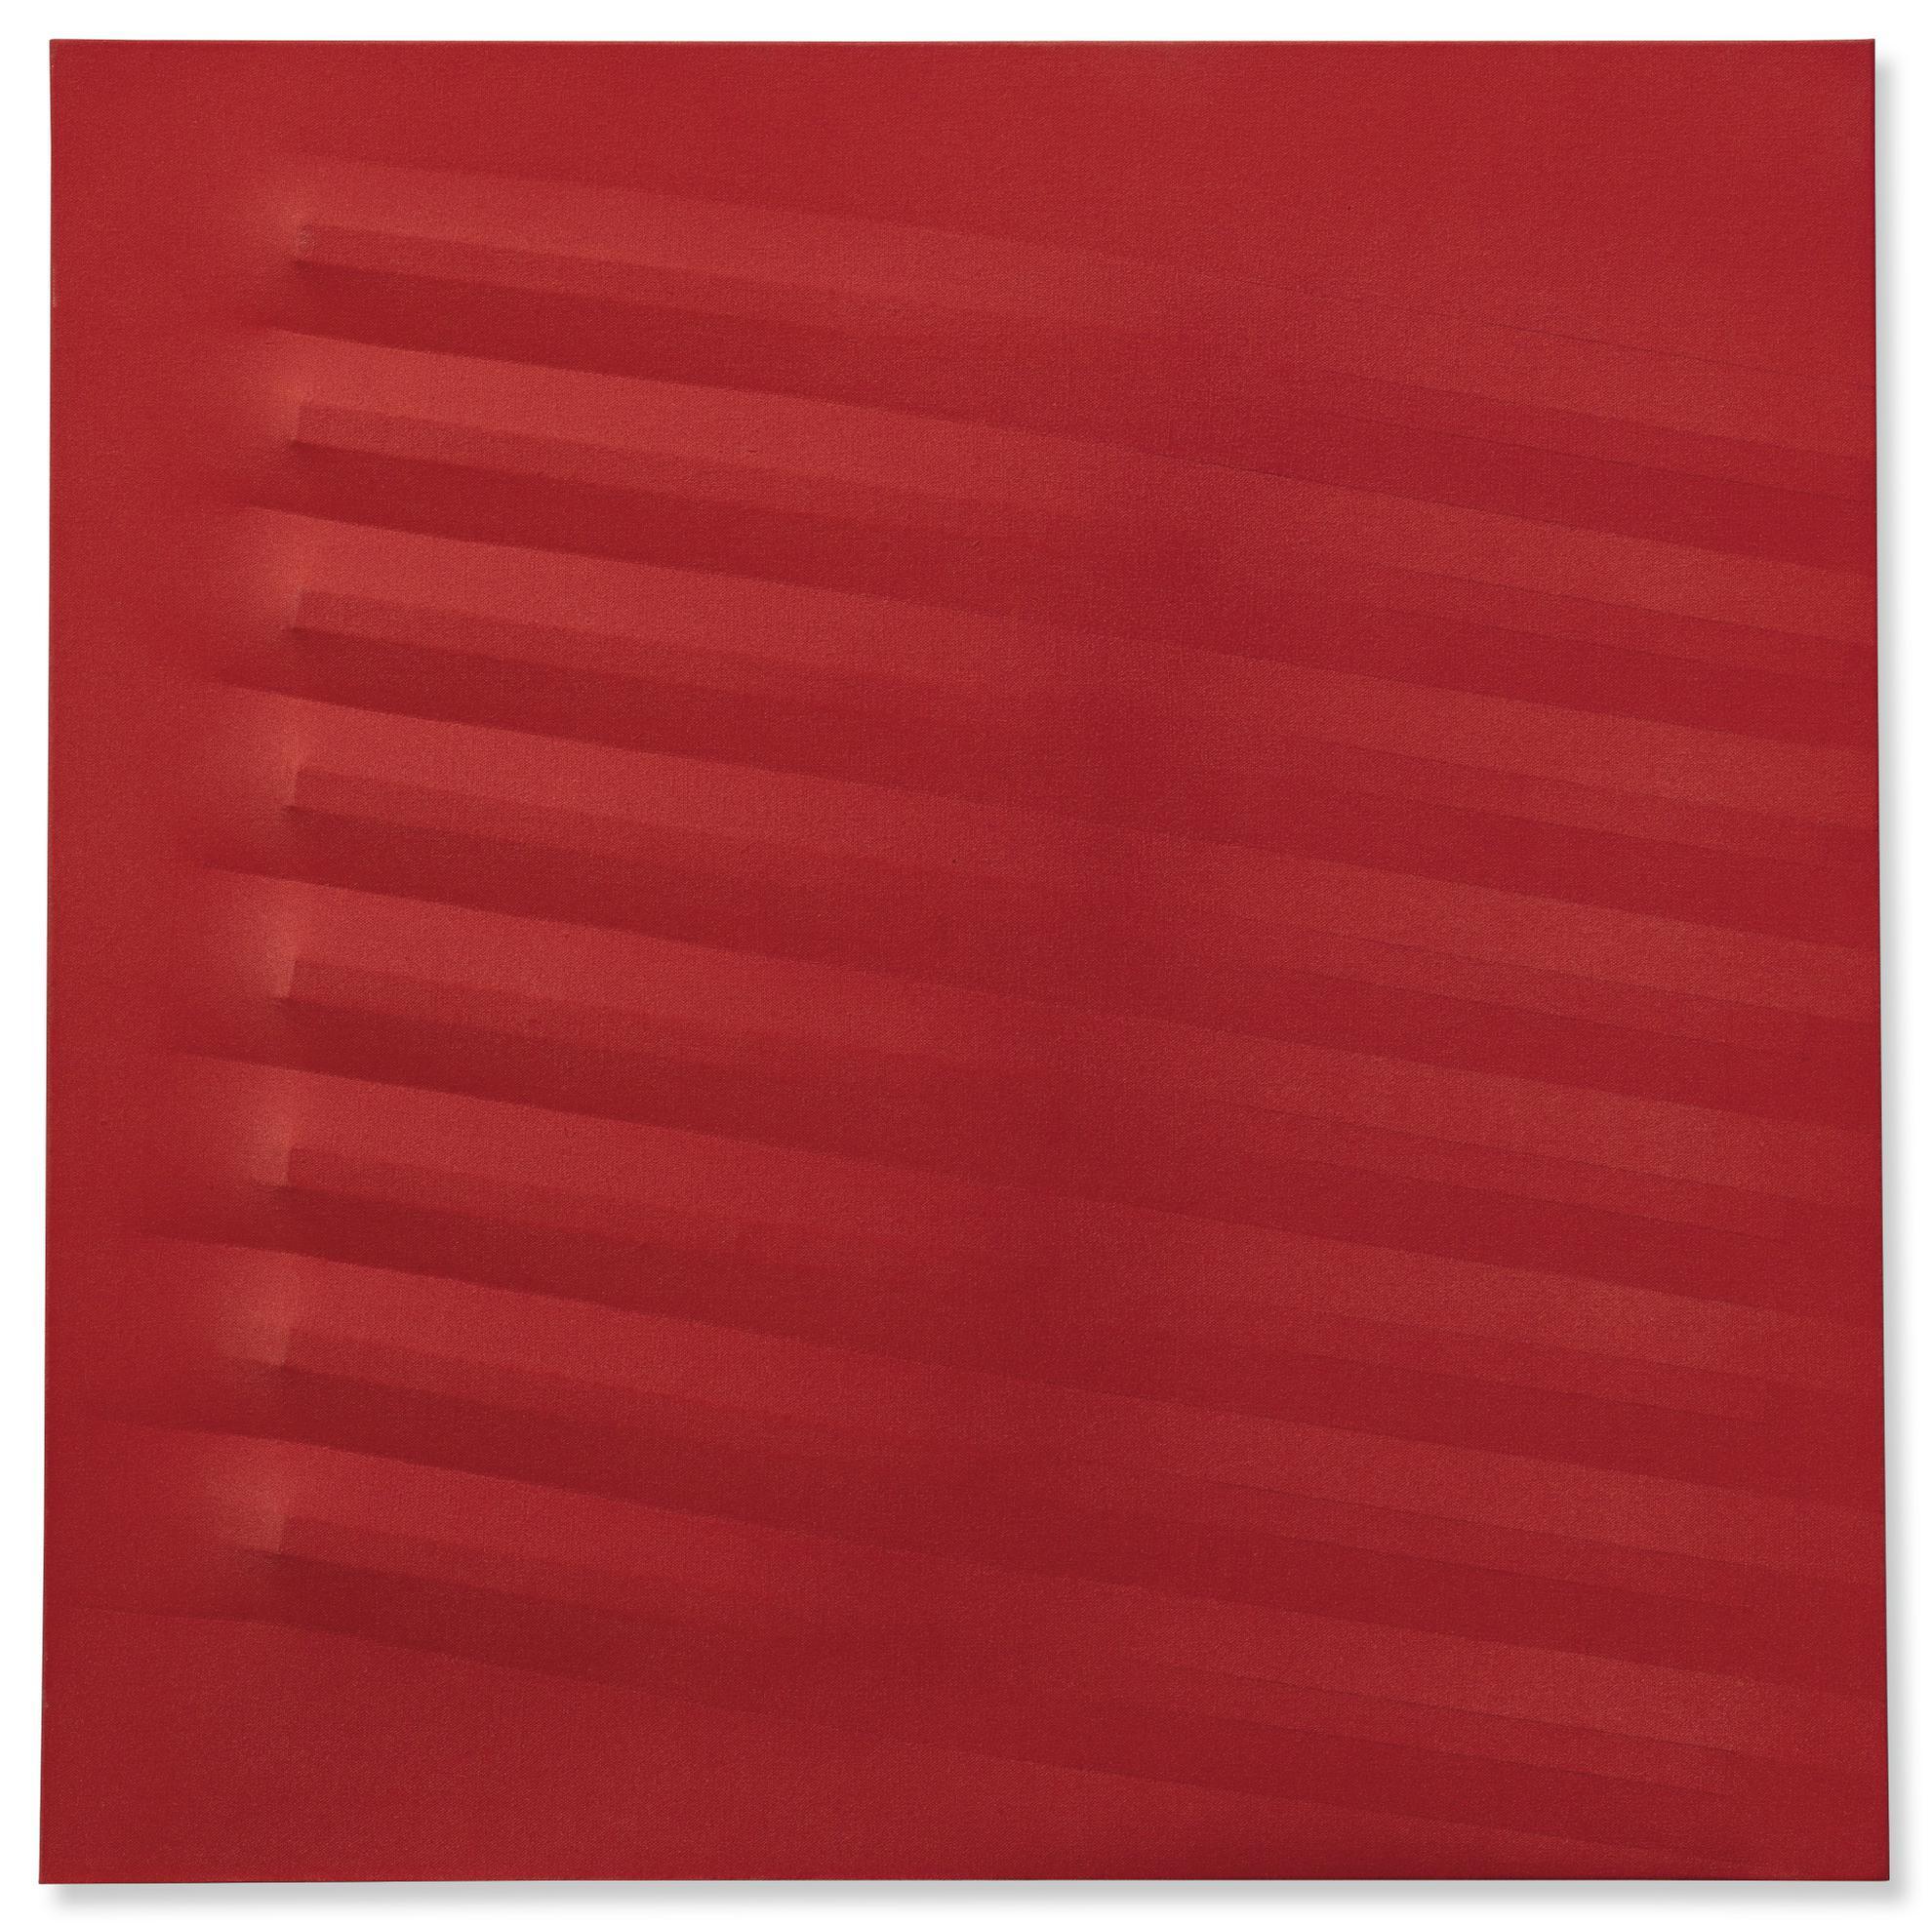 Agostino Bonalumi-Rosso-1979